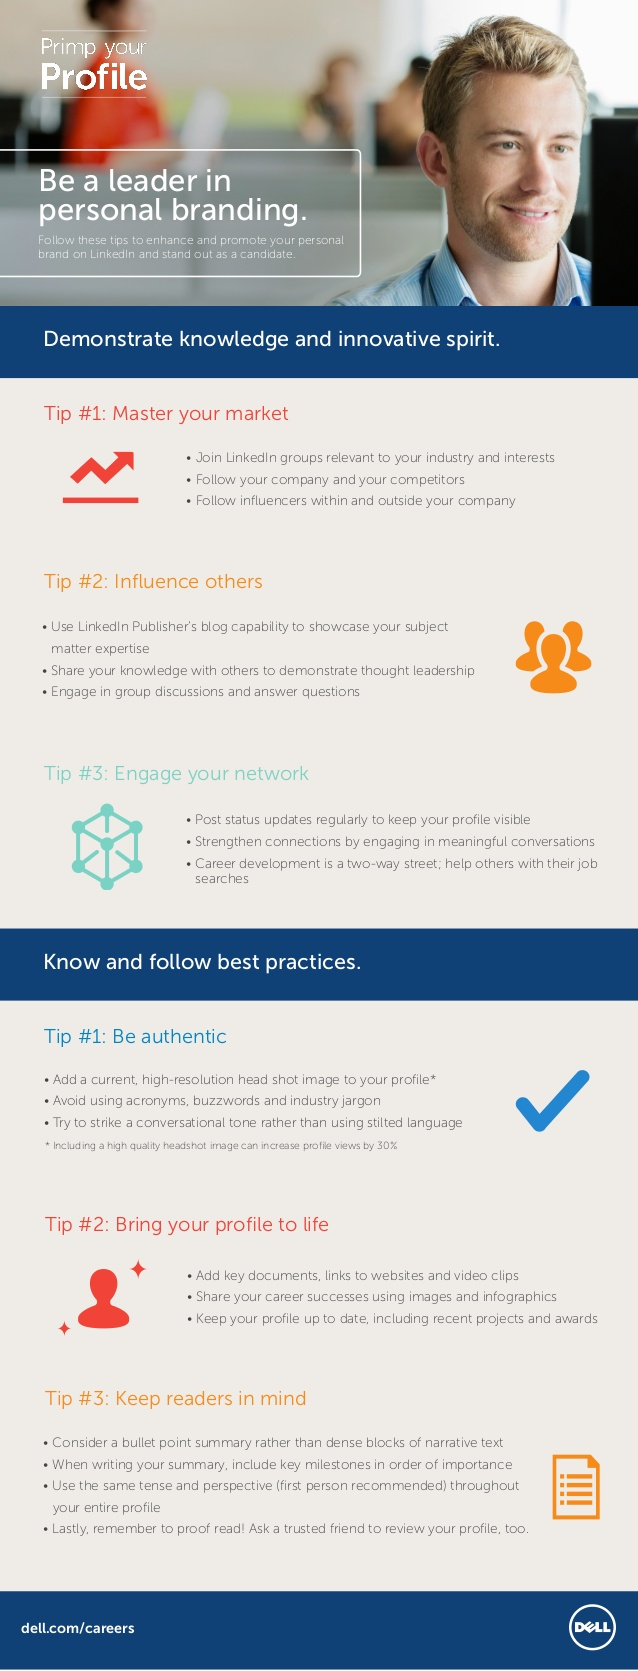 6 consejos para acicalar tu perfil de Linkedin